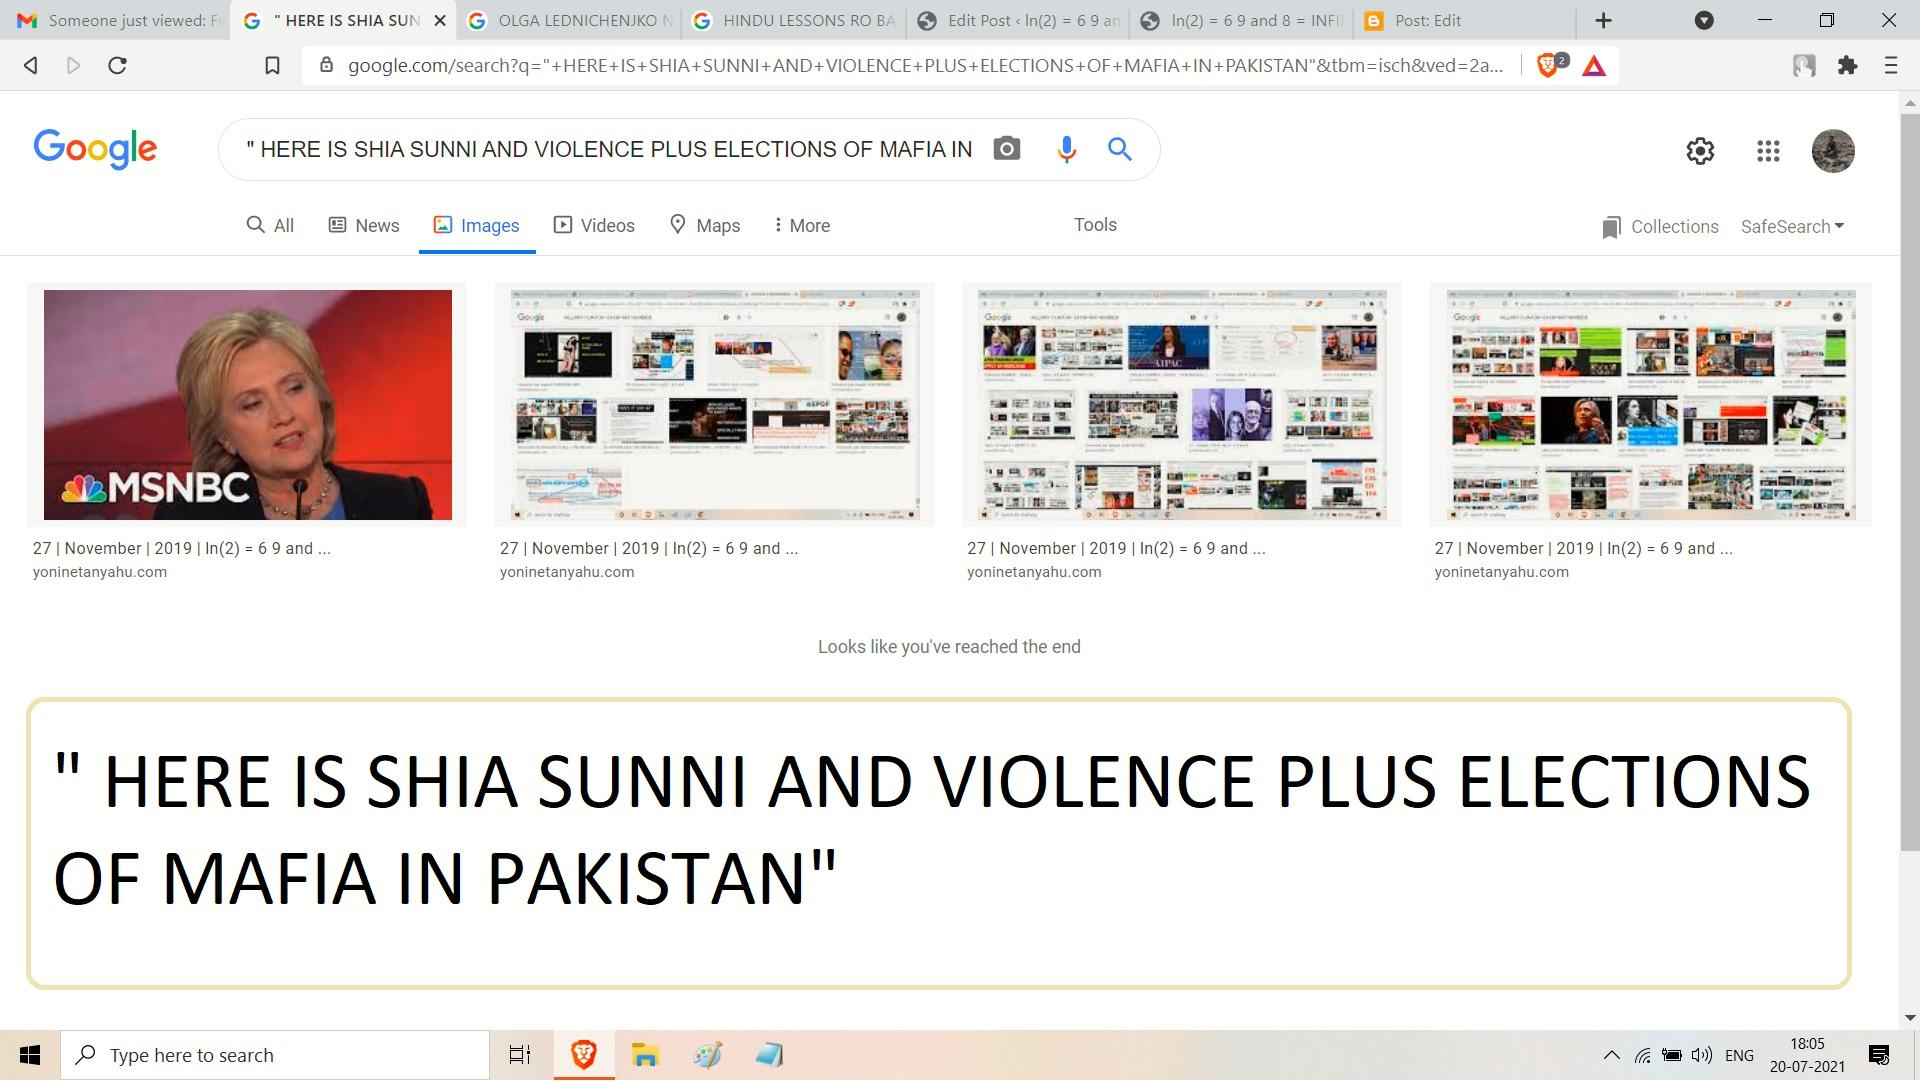 HERE IS SHIA SUNNI AND VIOLENCE PLUS ELECTIONS OF MAFIA IN PAKISTAN